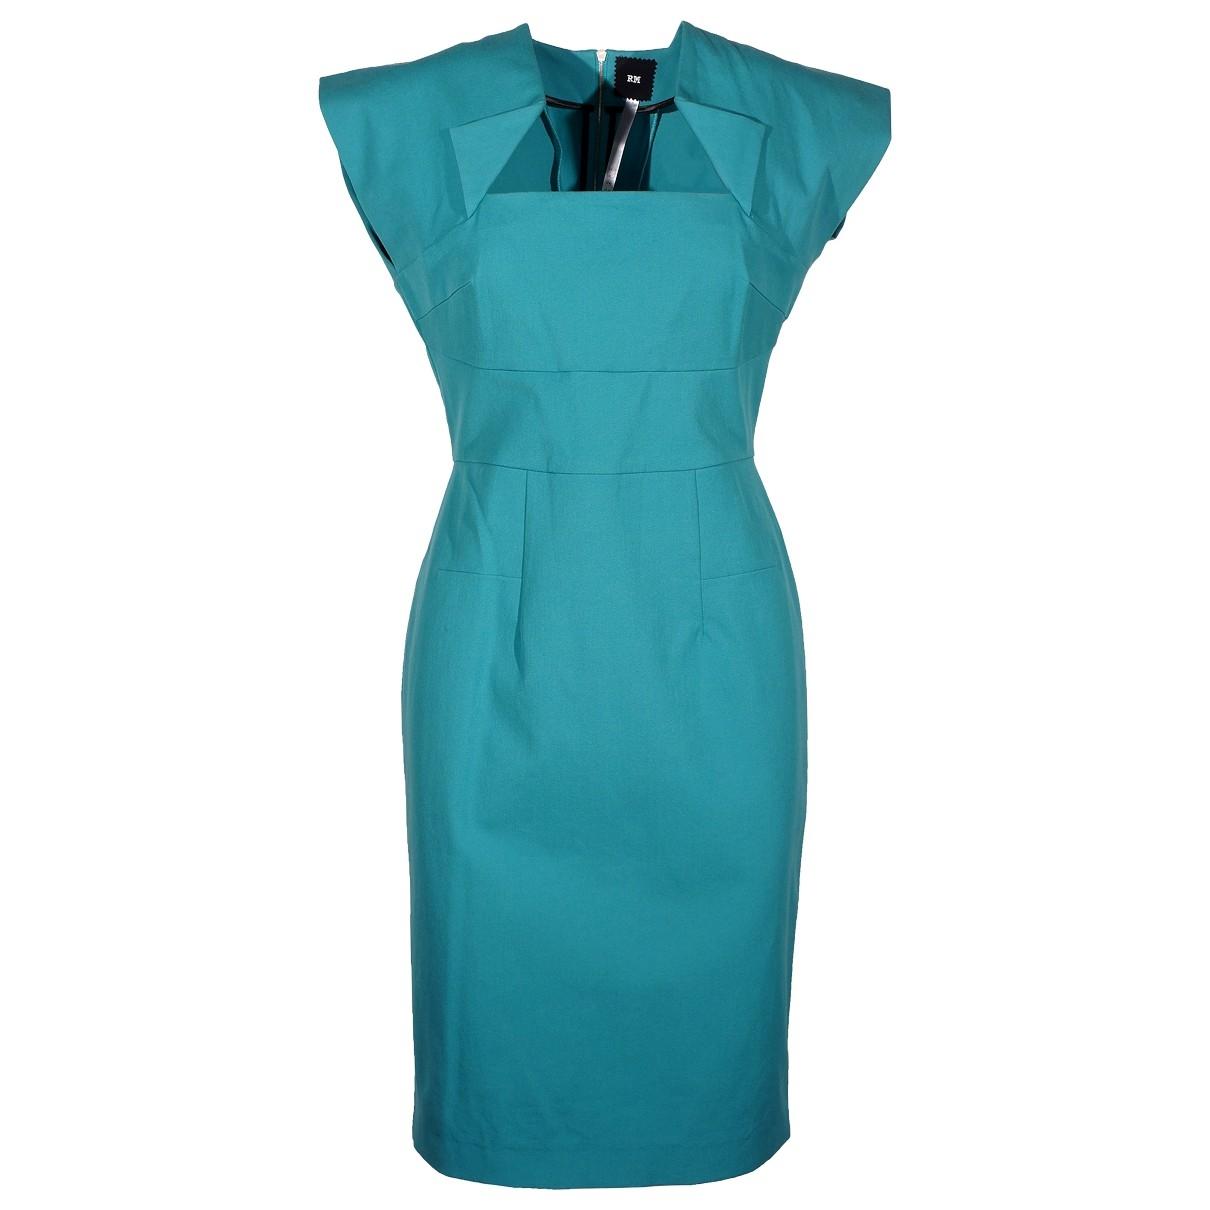 Roland Mouret \N Turquoise Cotton dress for Women 10 US